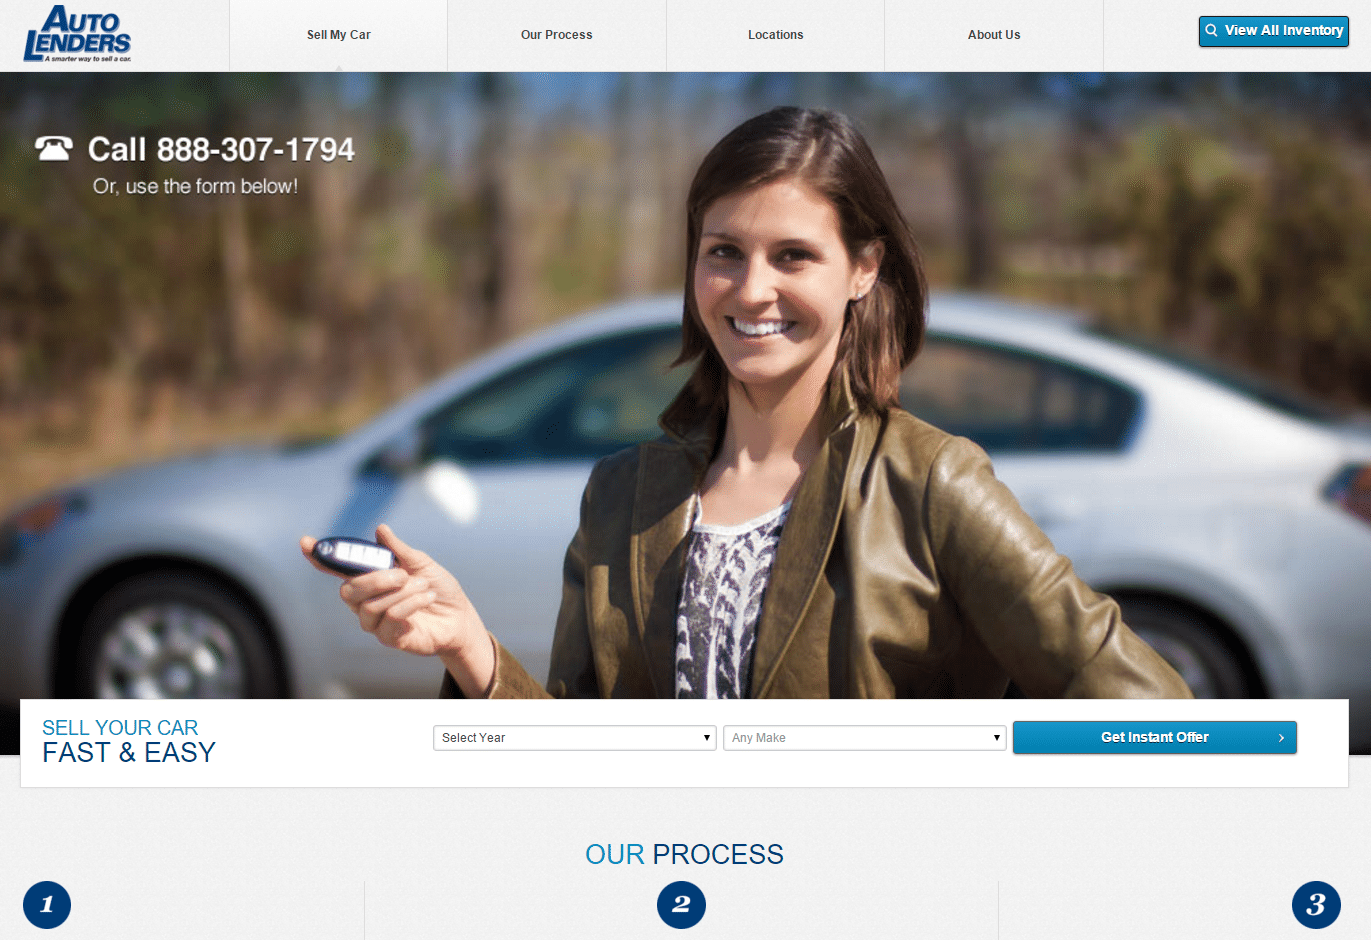 AutoLenders Landing Page